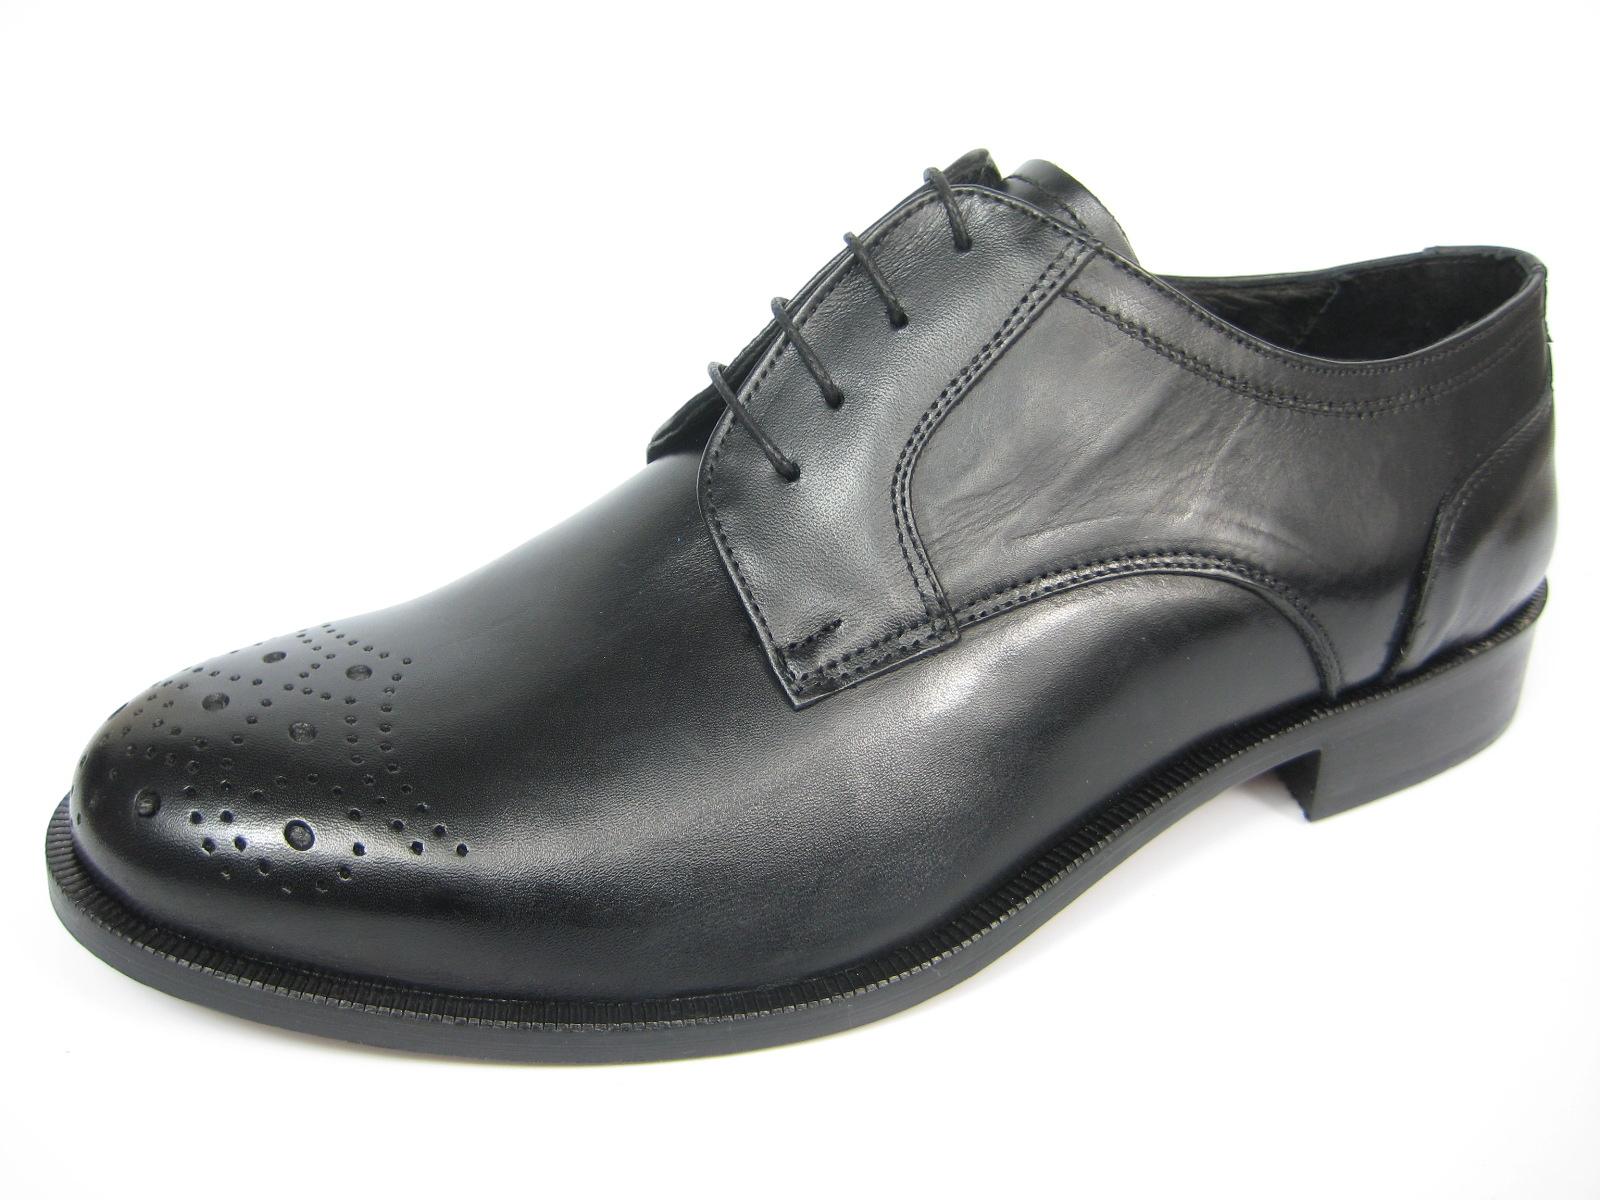 GIORGIO SCARPE 13114 Derby Leder Schuh Handgenäht Ledersohle schwarz//whisky